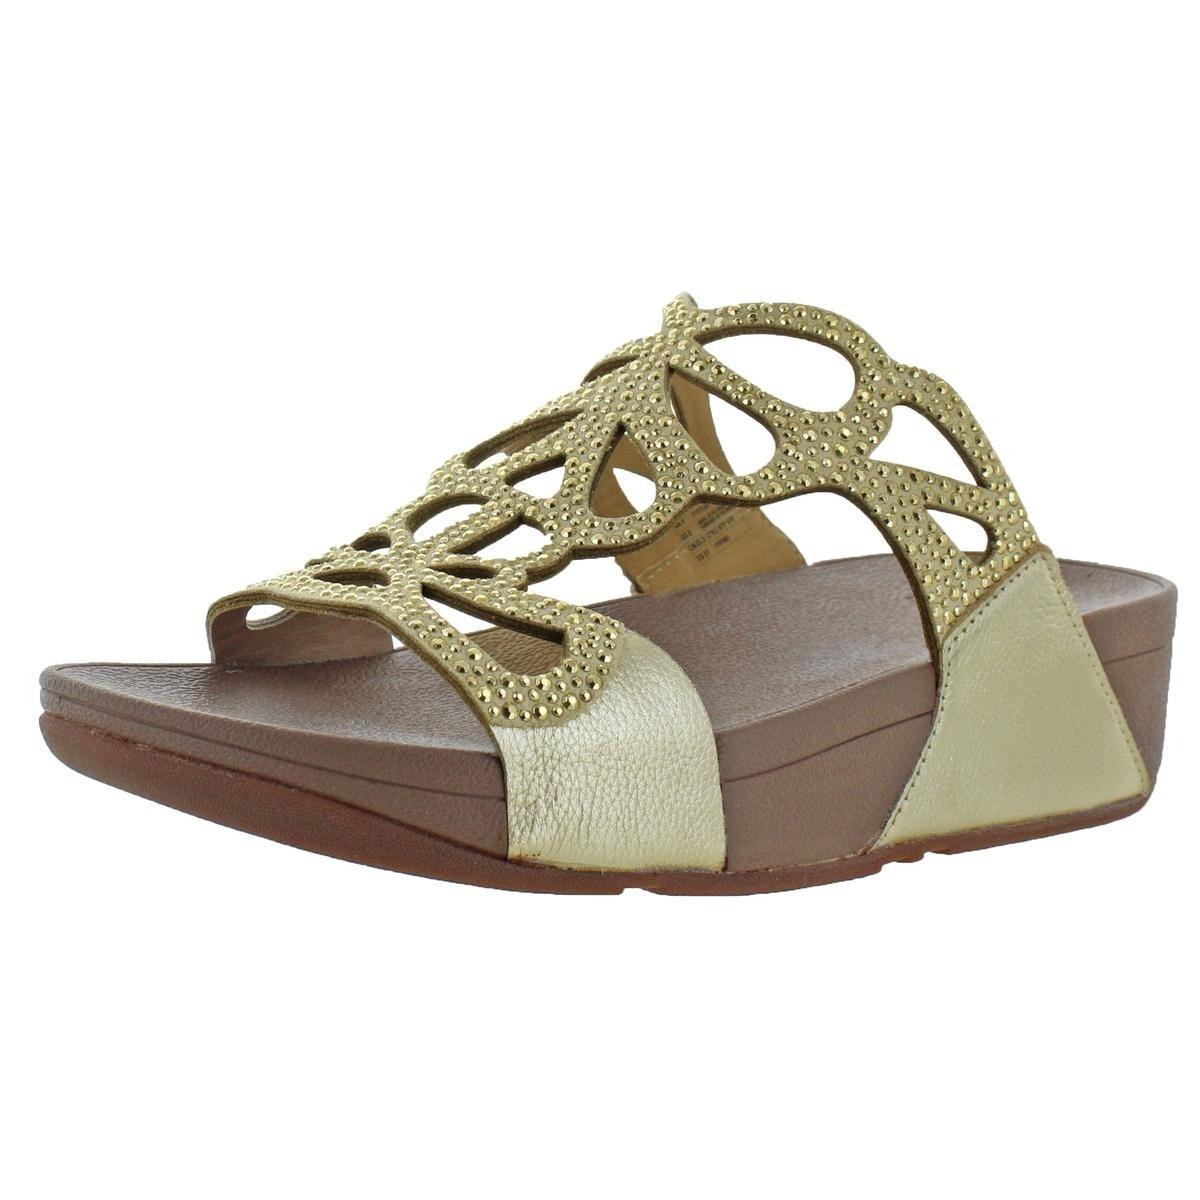 e698f4ea0cb Fitflop Womens Bumble Crystal Slide Slide Sandals Leather Slip On - 6  Medium (B